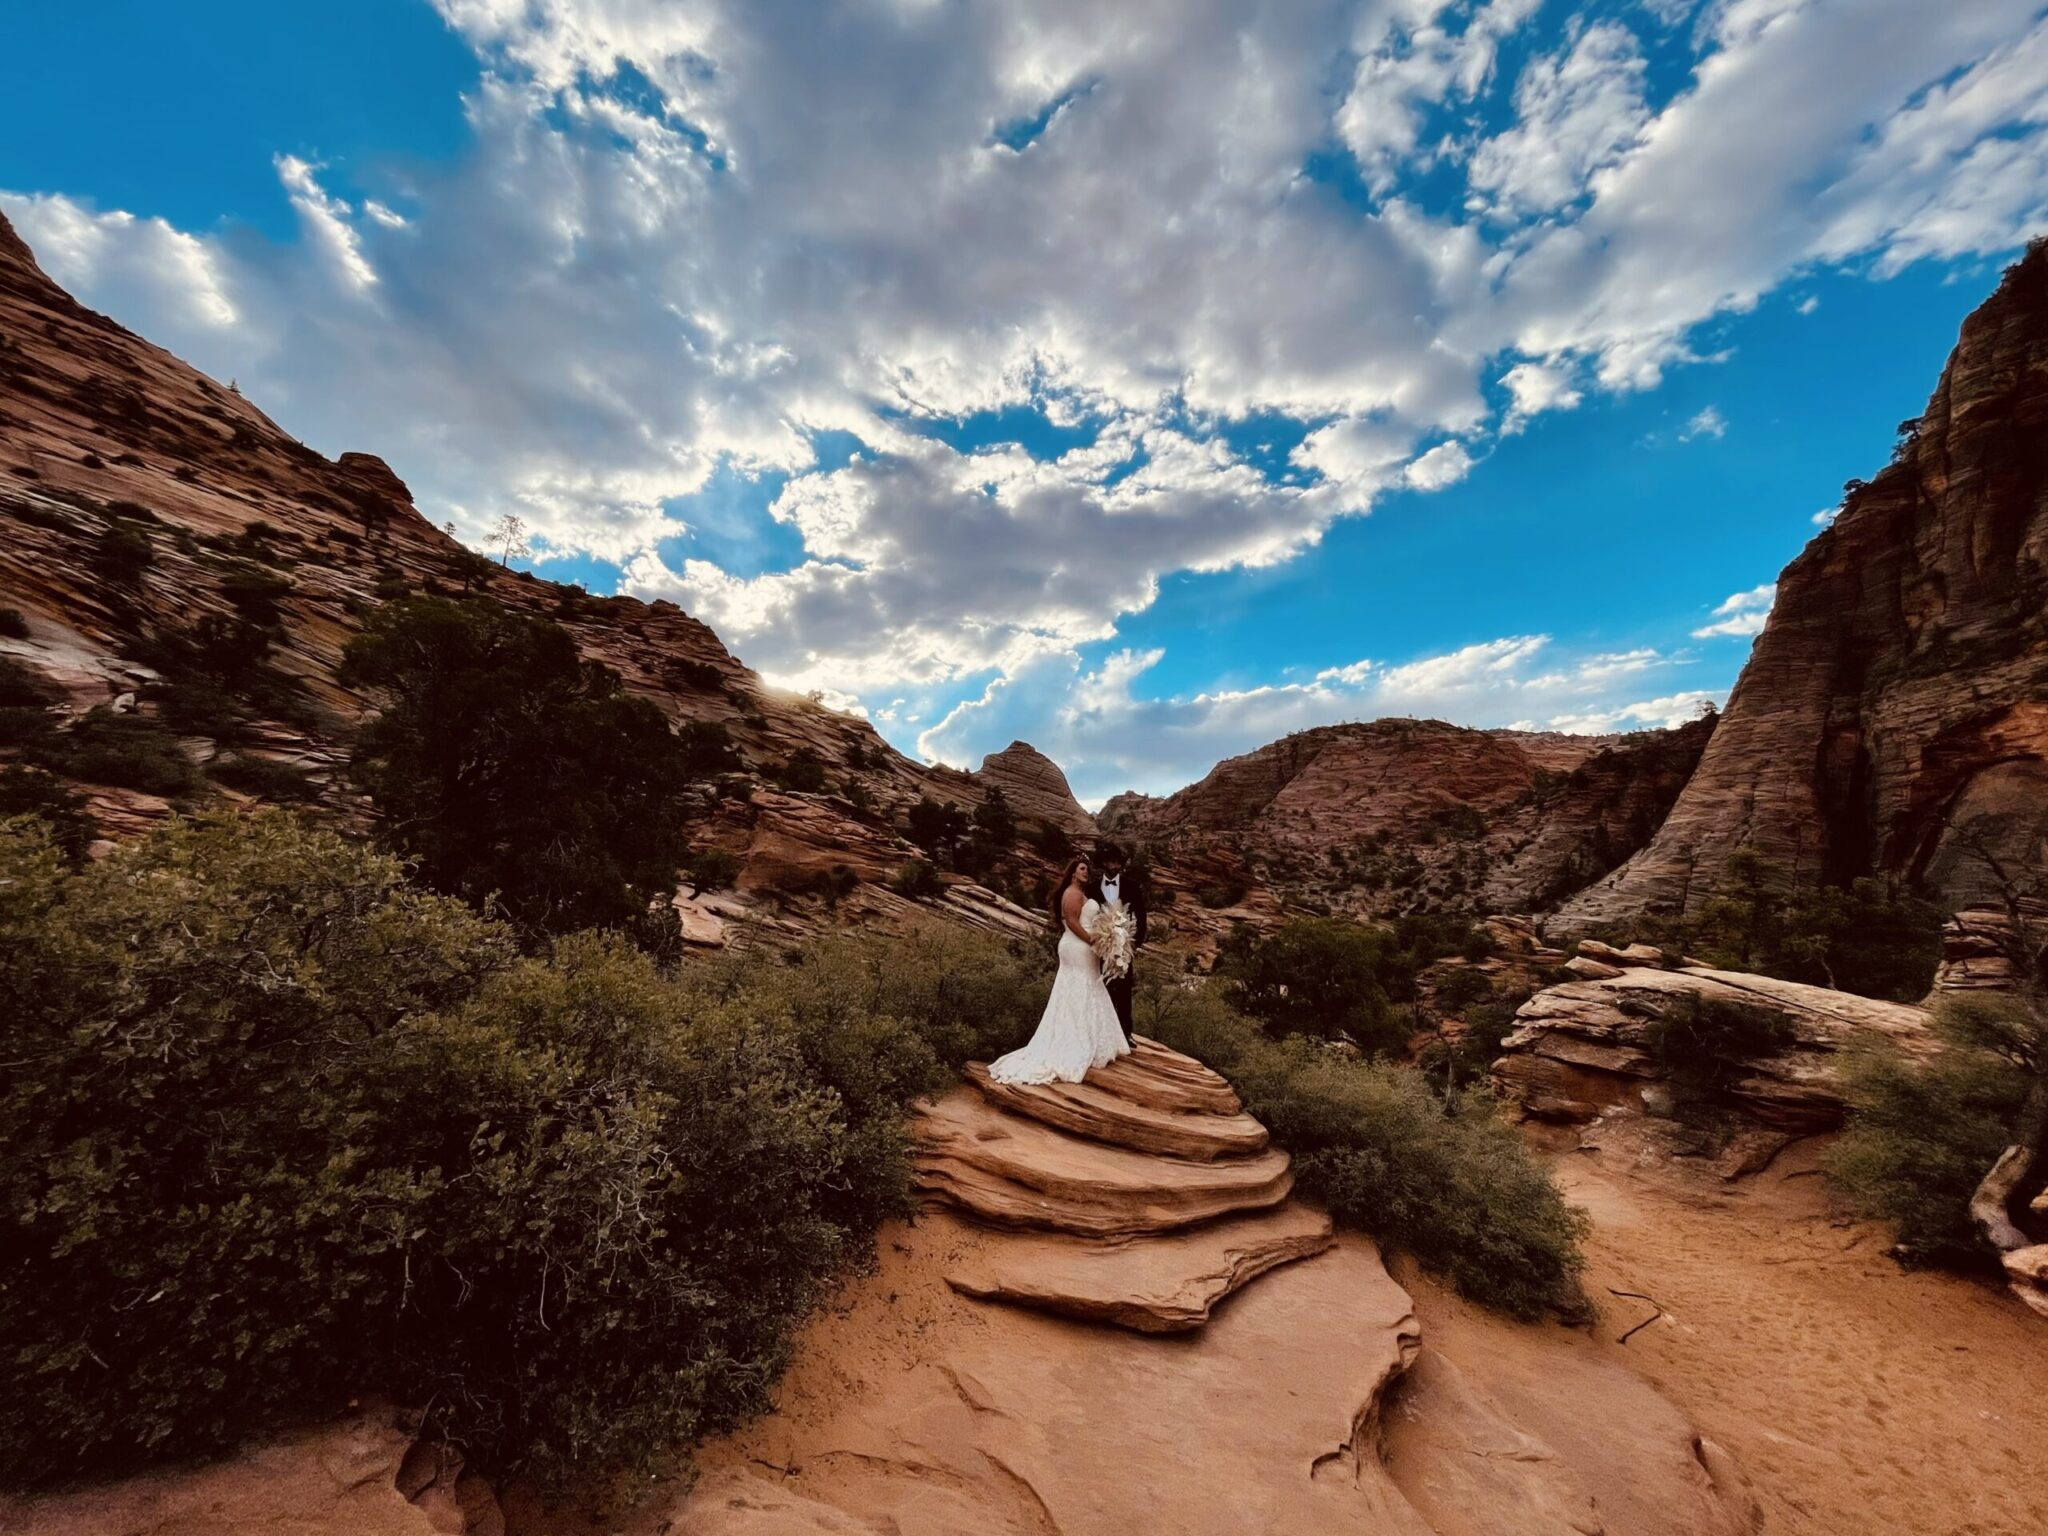 Zion national Park Wedding Photography | Ashae + Austin